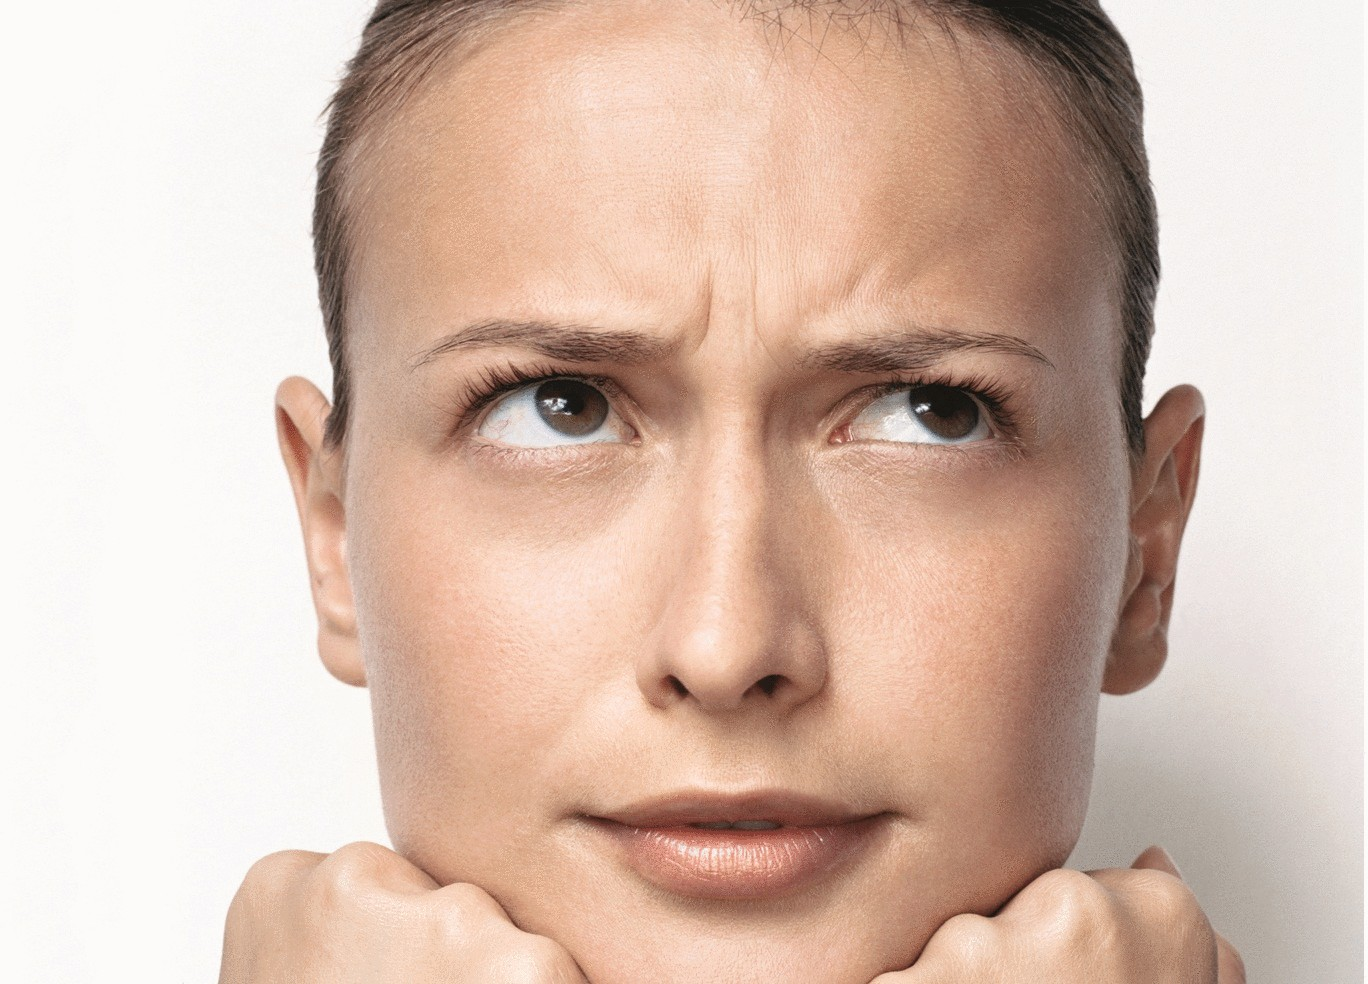 Гимнастика для разглаживания морщин на лице - YouTube